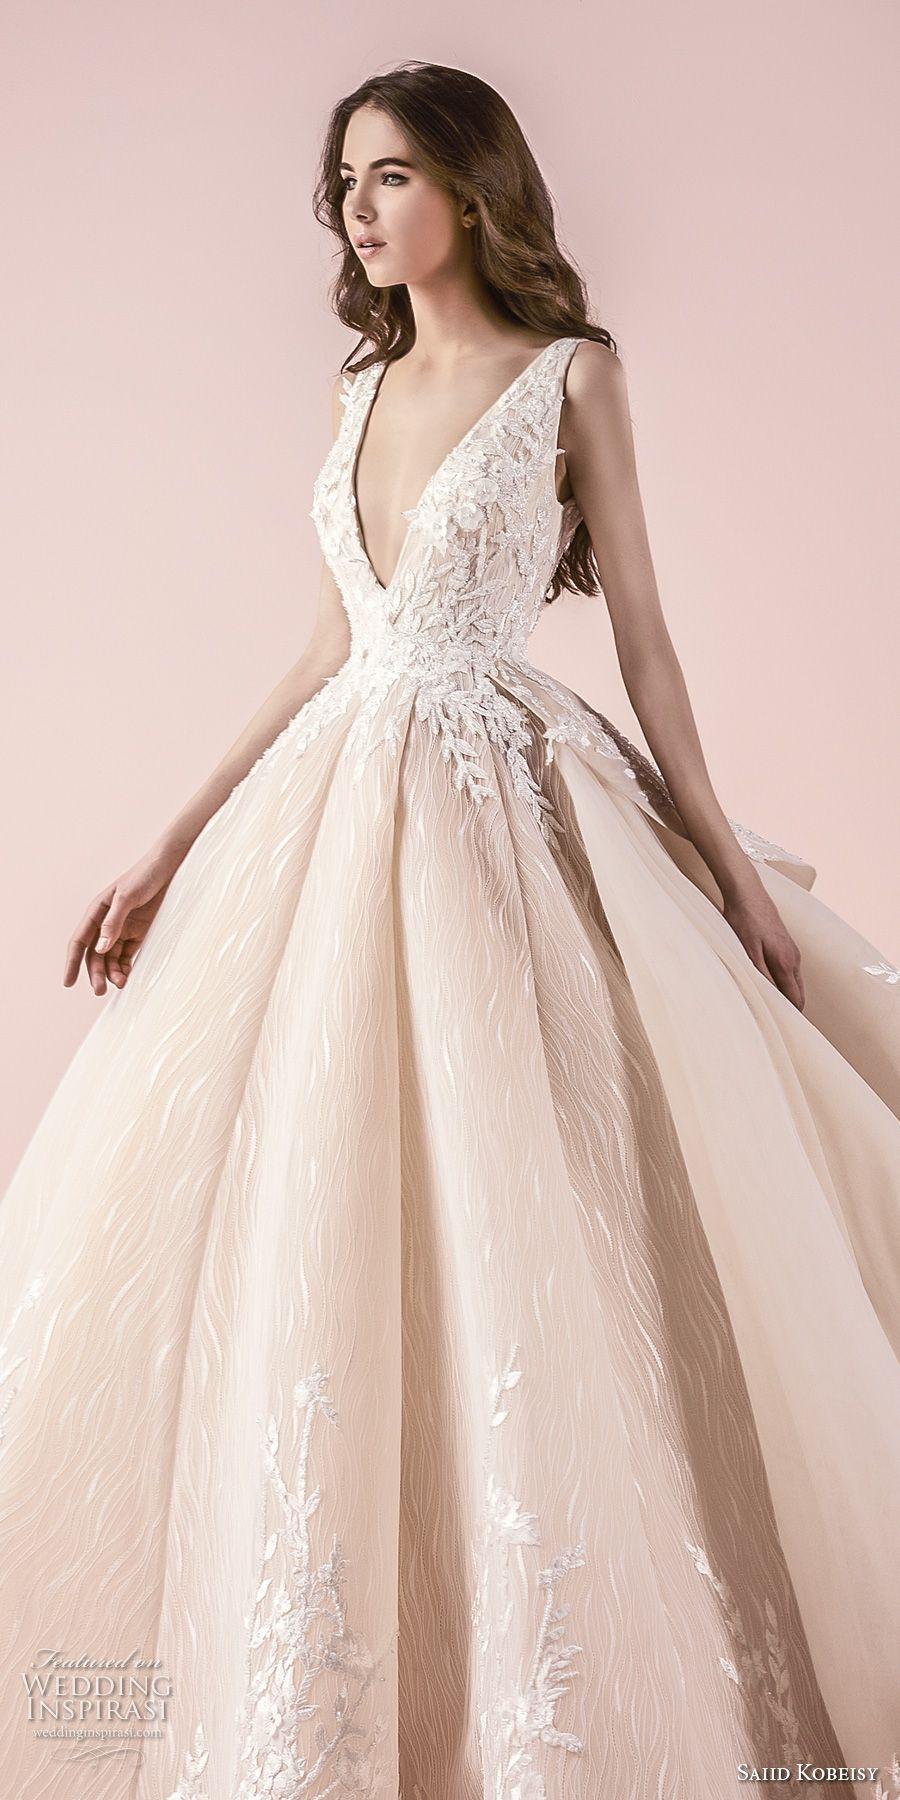 Saiid Kobeisy 2018 Wedding Dresses | Wedding gowns | Pinterest ...